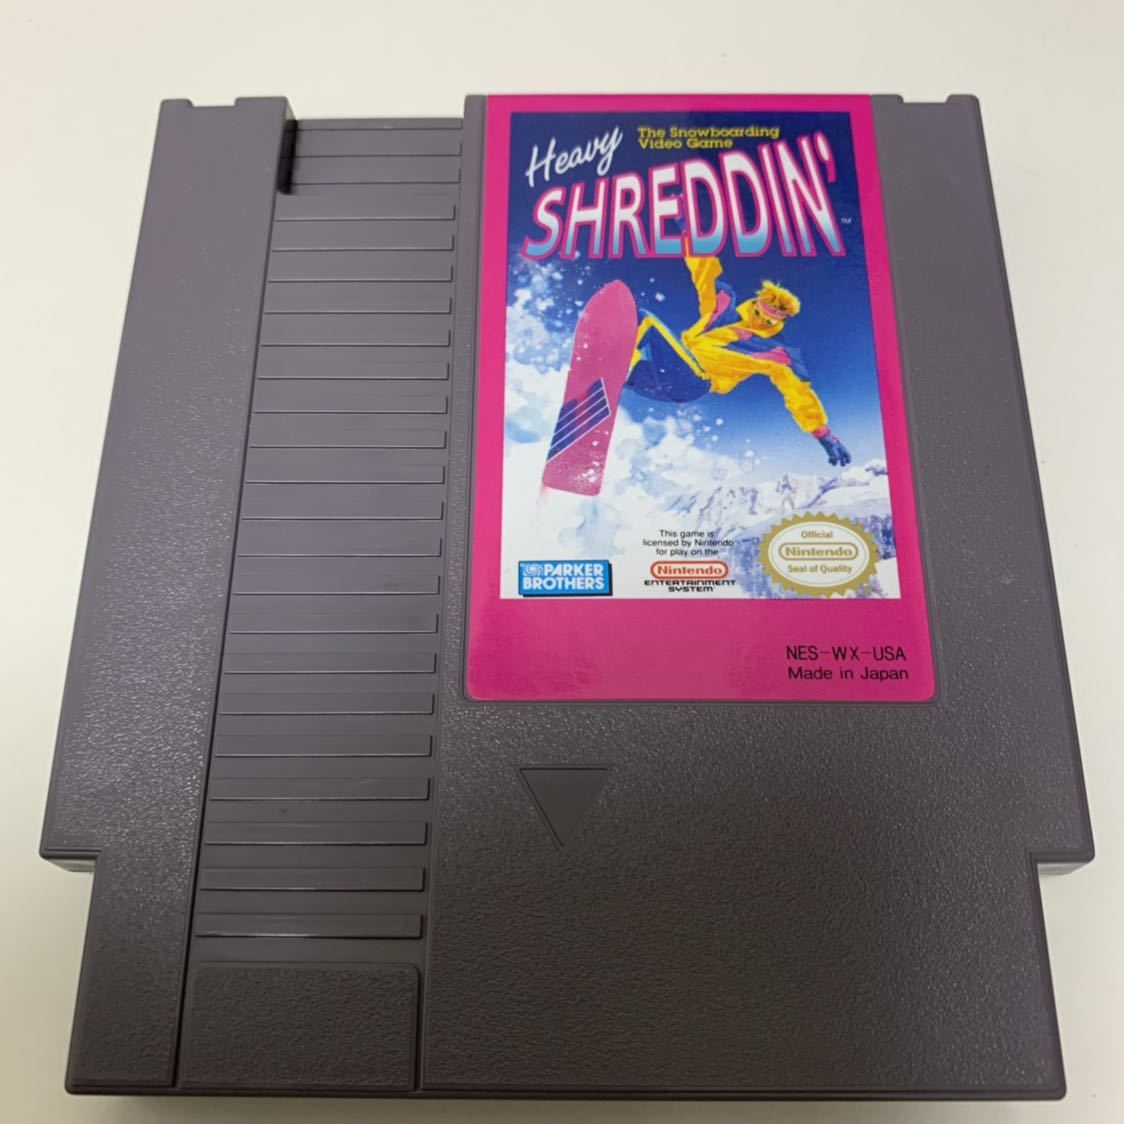 NES 海外 北米版ファミコン 「Heavy SHREDDIN'」 日本未発売 送料185円_画像2